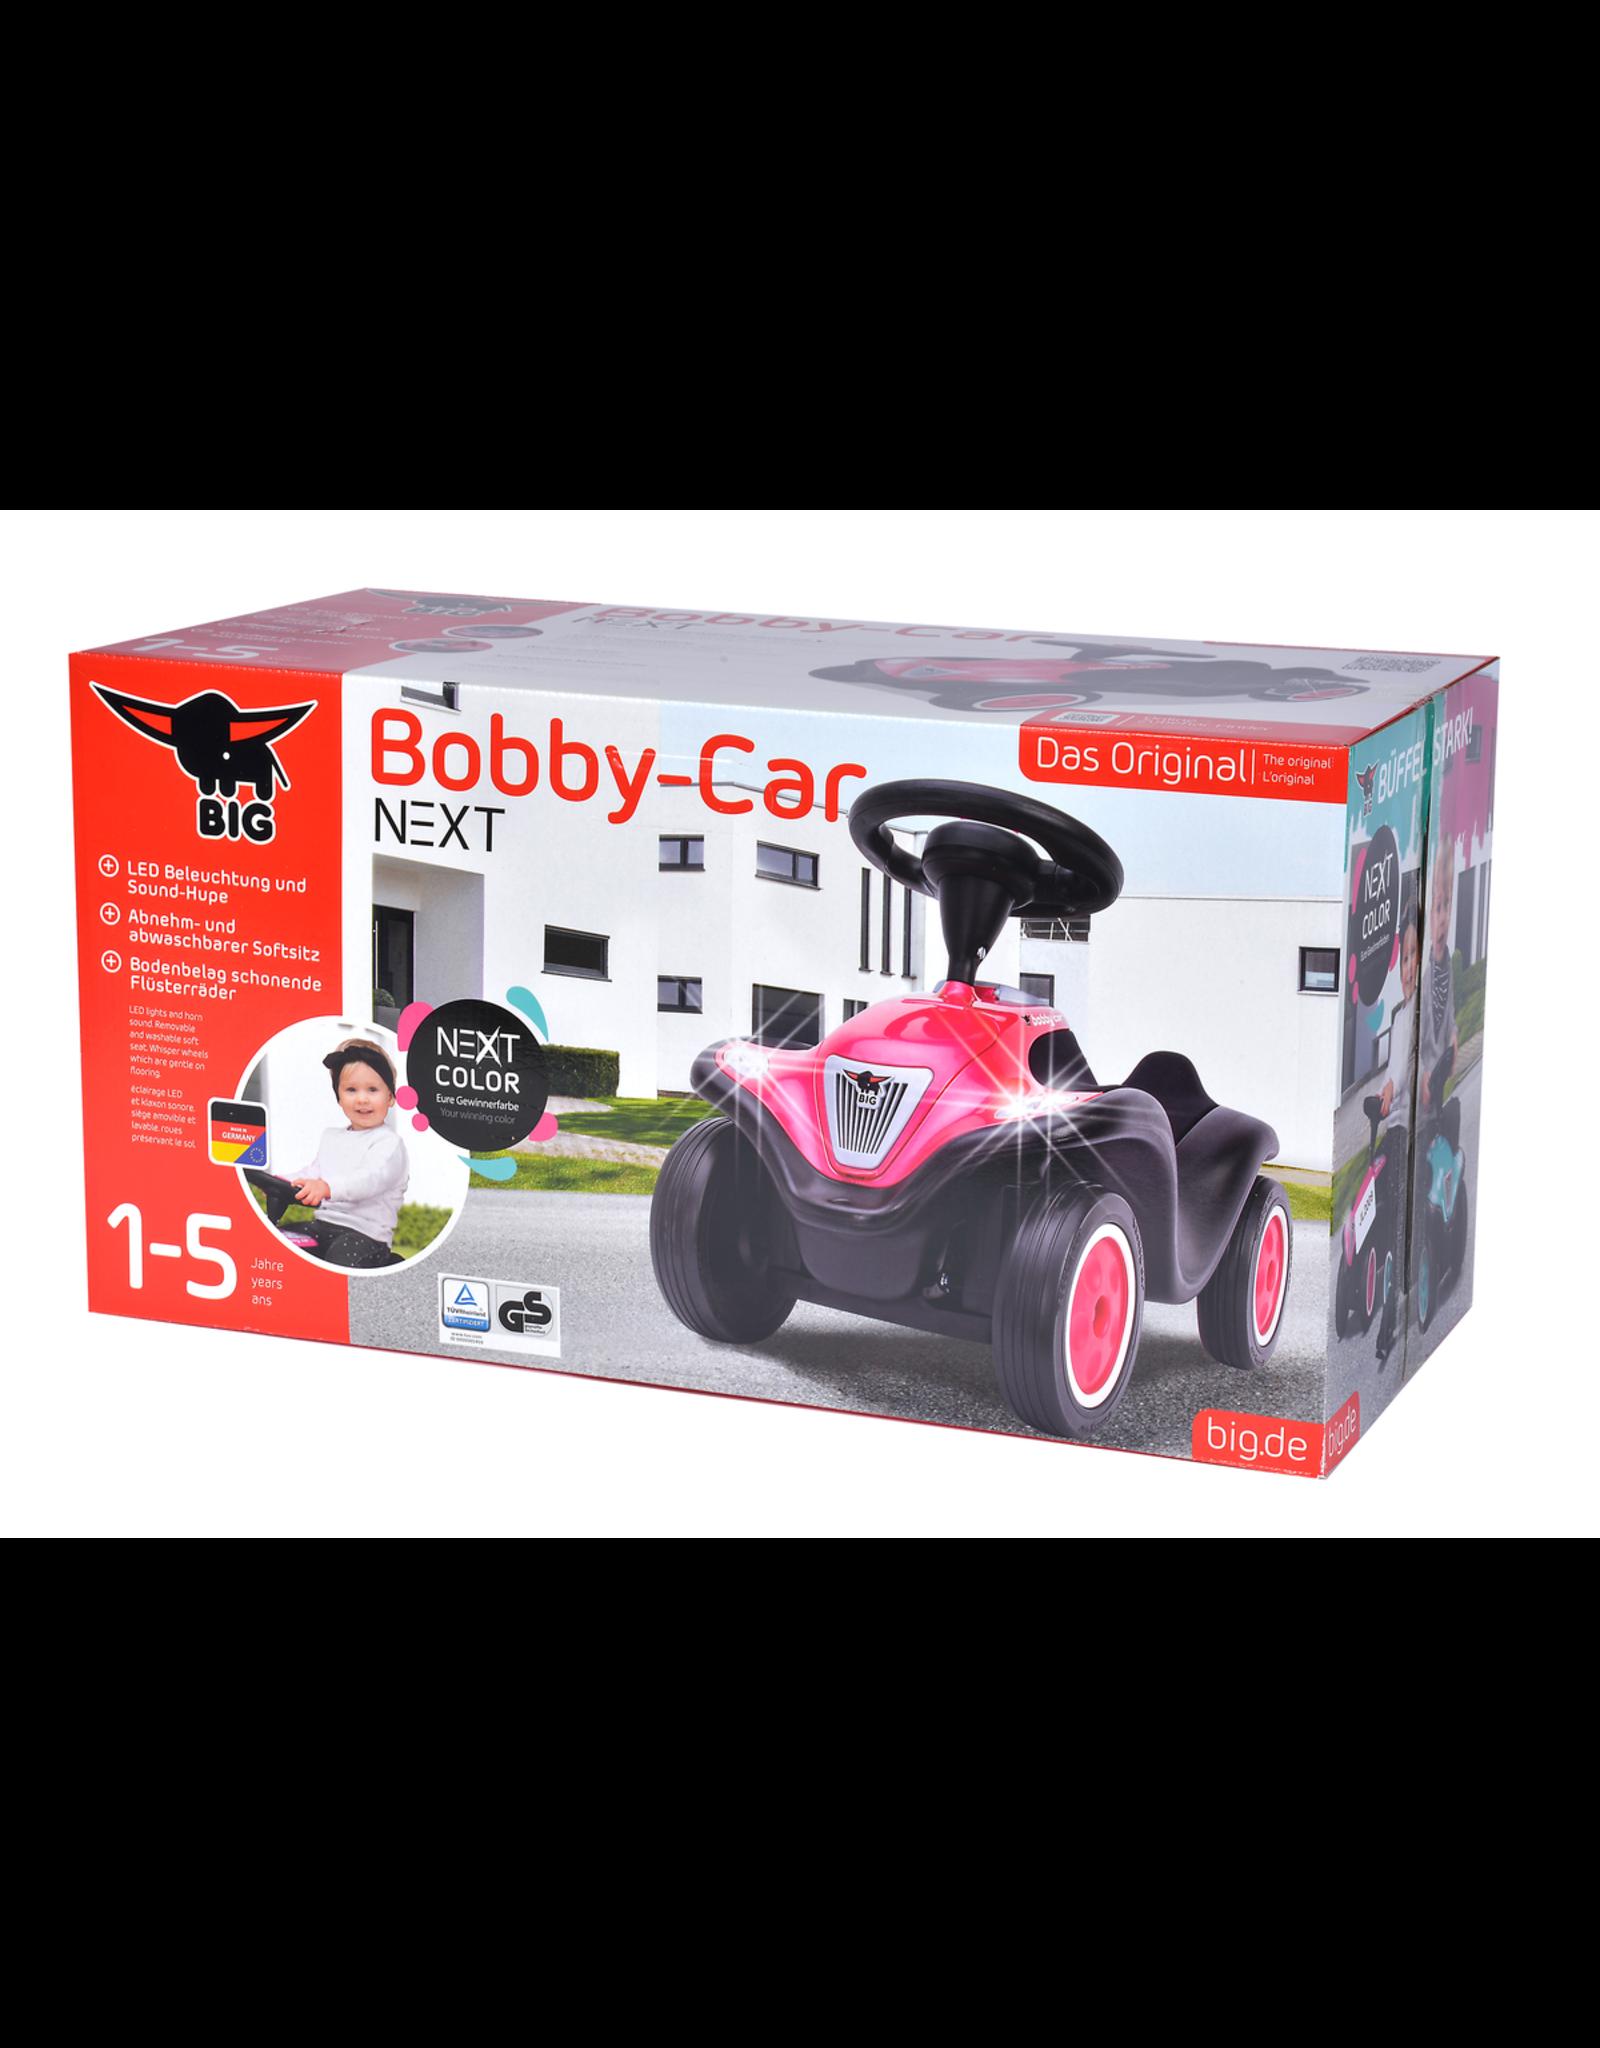 BIG BIG Bobby Car NEXT raspberry